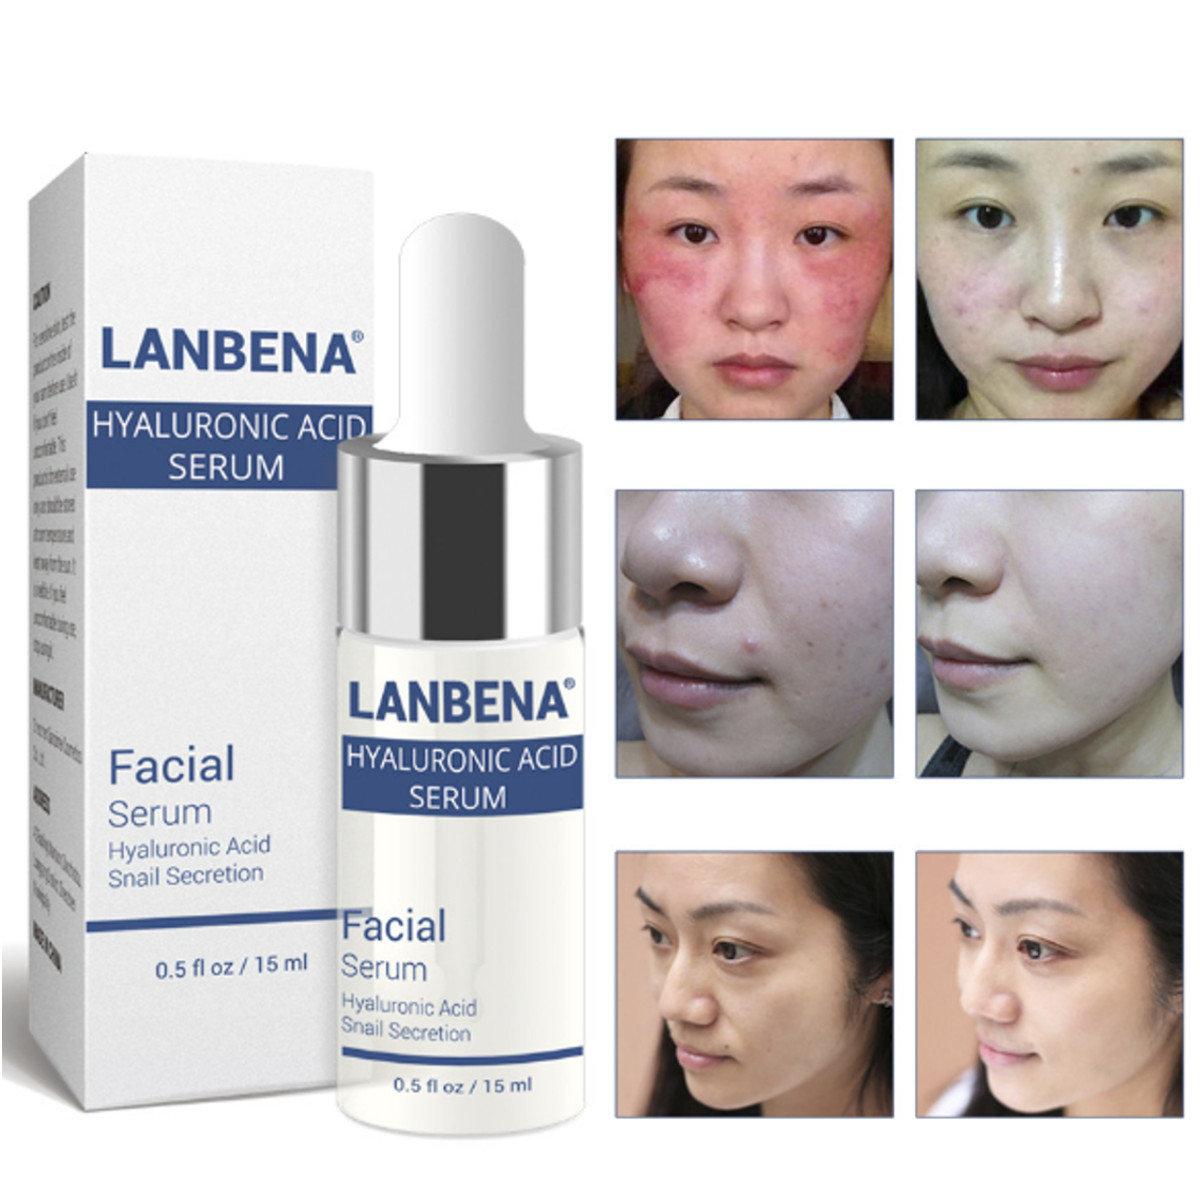 Hyaluronic Acid Snail Essence Moisturizing Acne Treatment Repair Whitening Anti-Aging Wrinkle Care